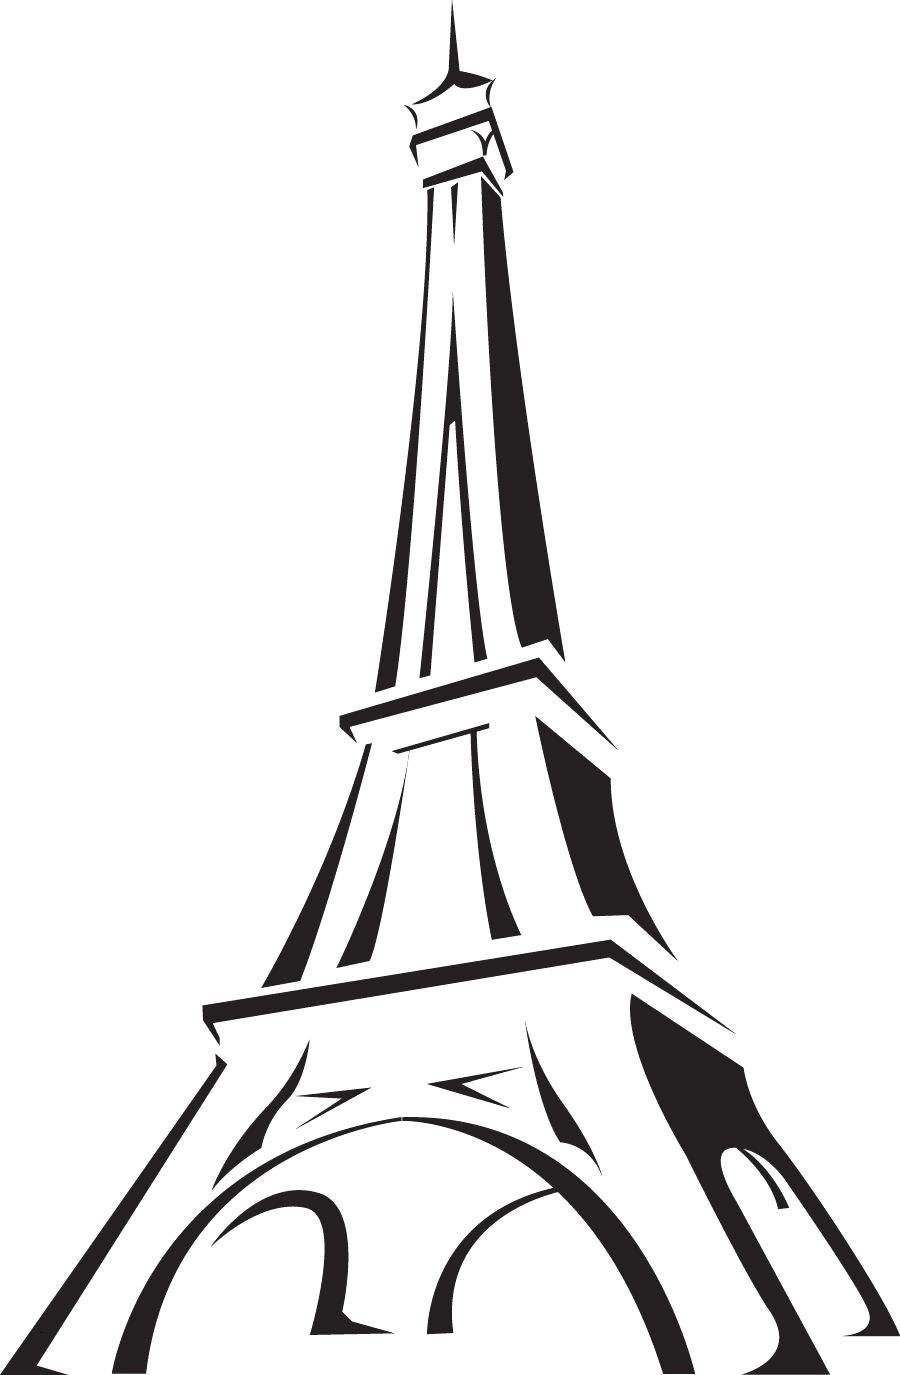 Eiffelturm Zum Ausmalen Frisch 40 Ausmalbilder Eiffelturm Scoredatscore Best Malvorlagen Acryl Stock